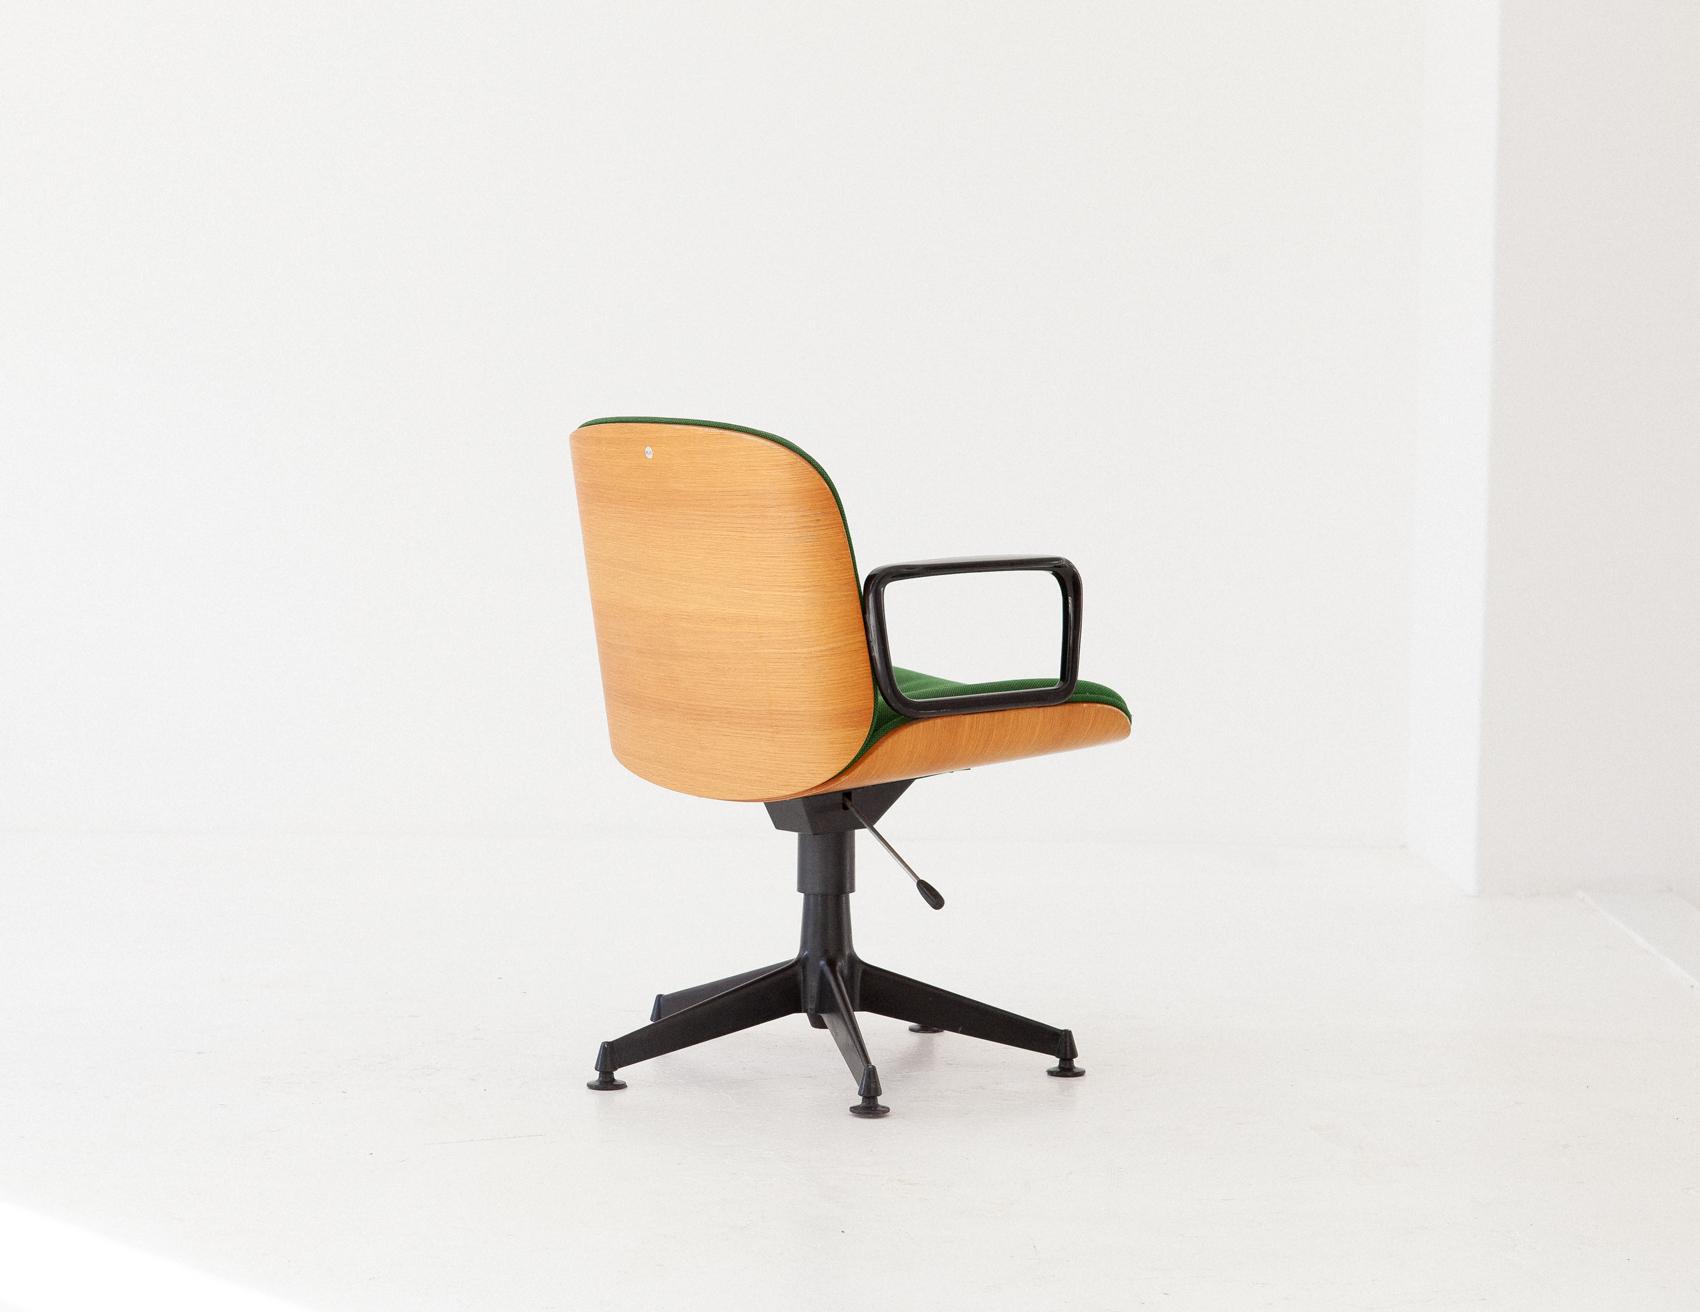 SE278-swivel-armchair-ico-parisi-mim-3